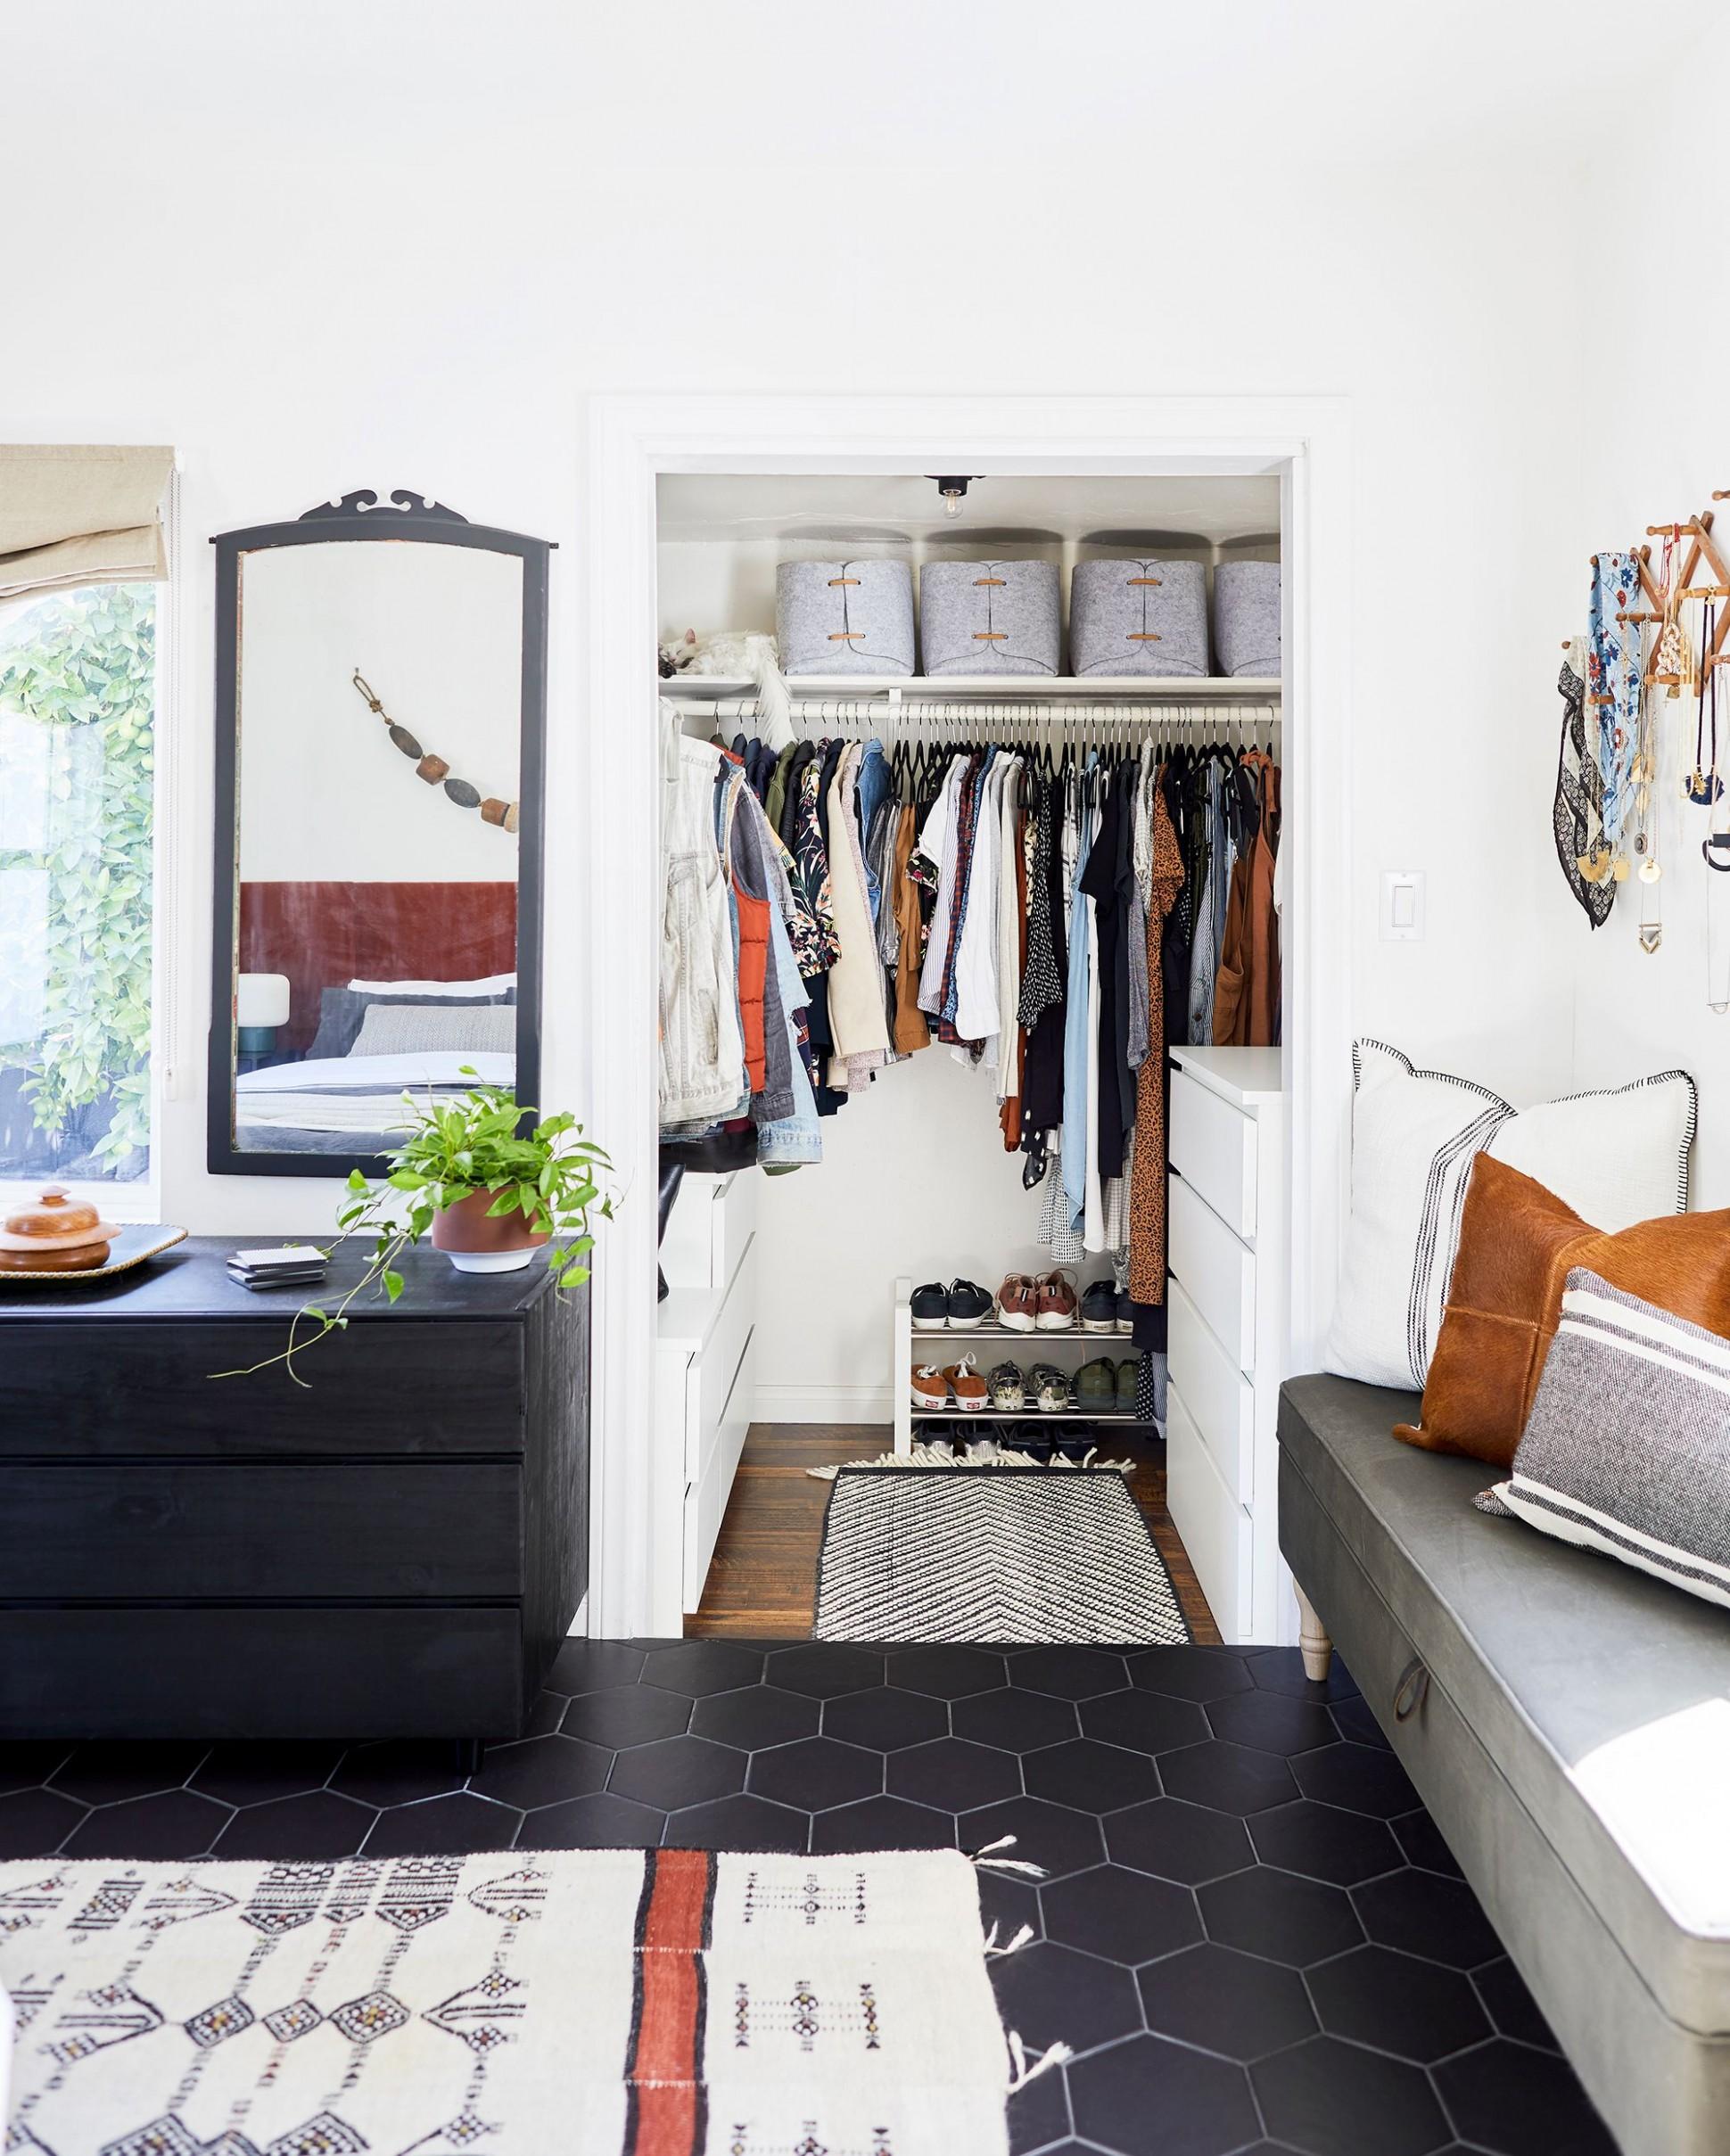 9 Best Small Closet Organization Ideas - Storage Tips for Small  - Closet Ideas Small Bedrooms